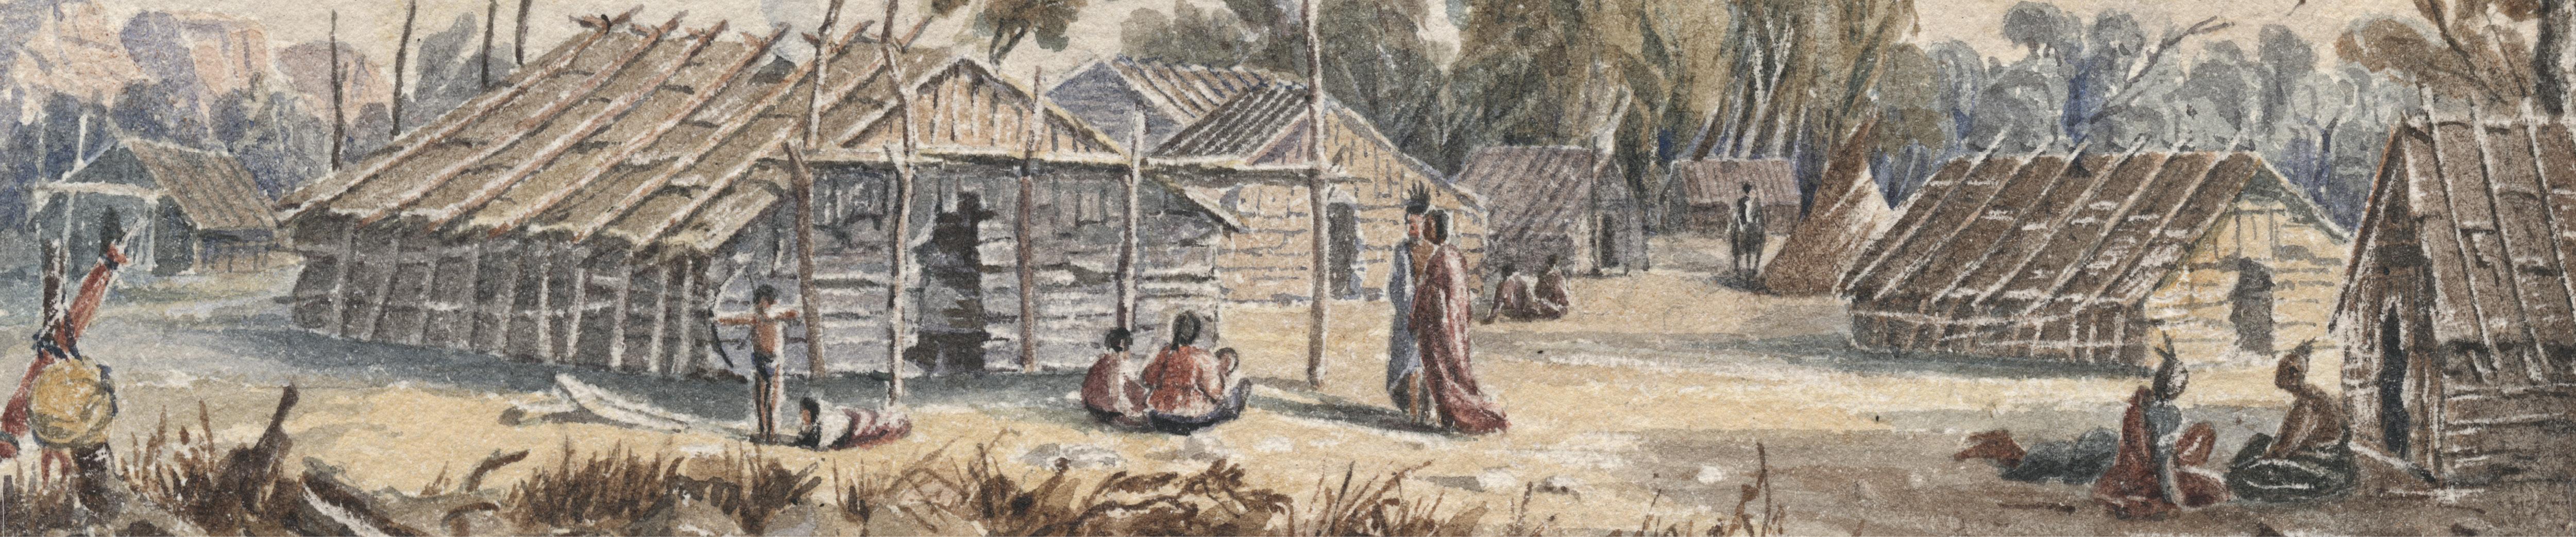 Dakota summer lodge, 1846–1848. Watercolor painting by Seth Eastman.